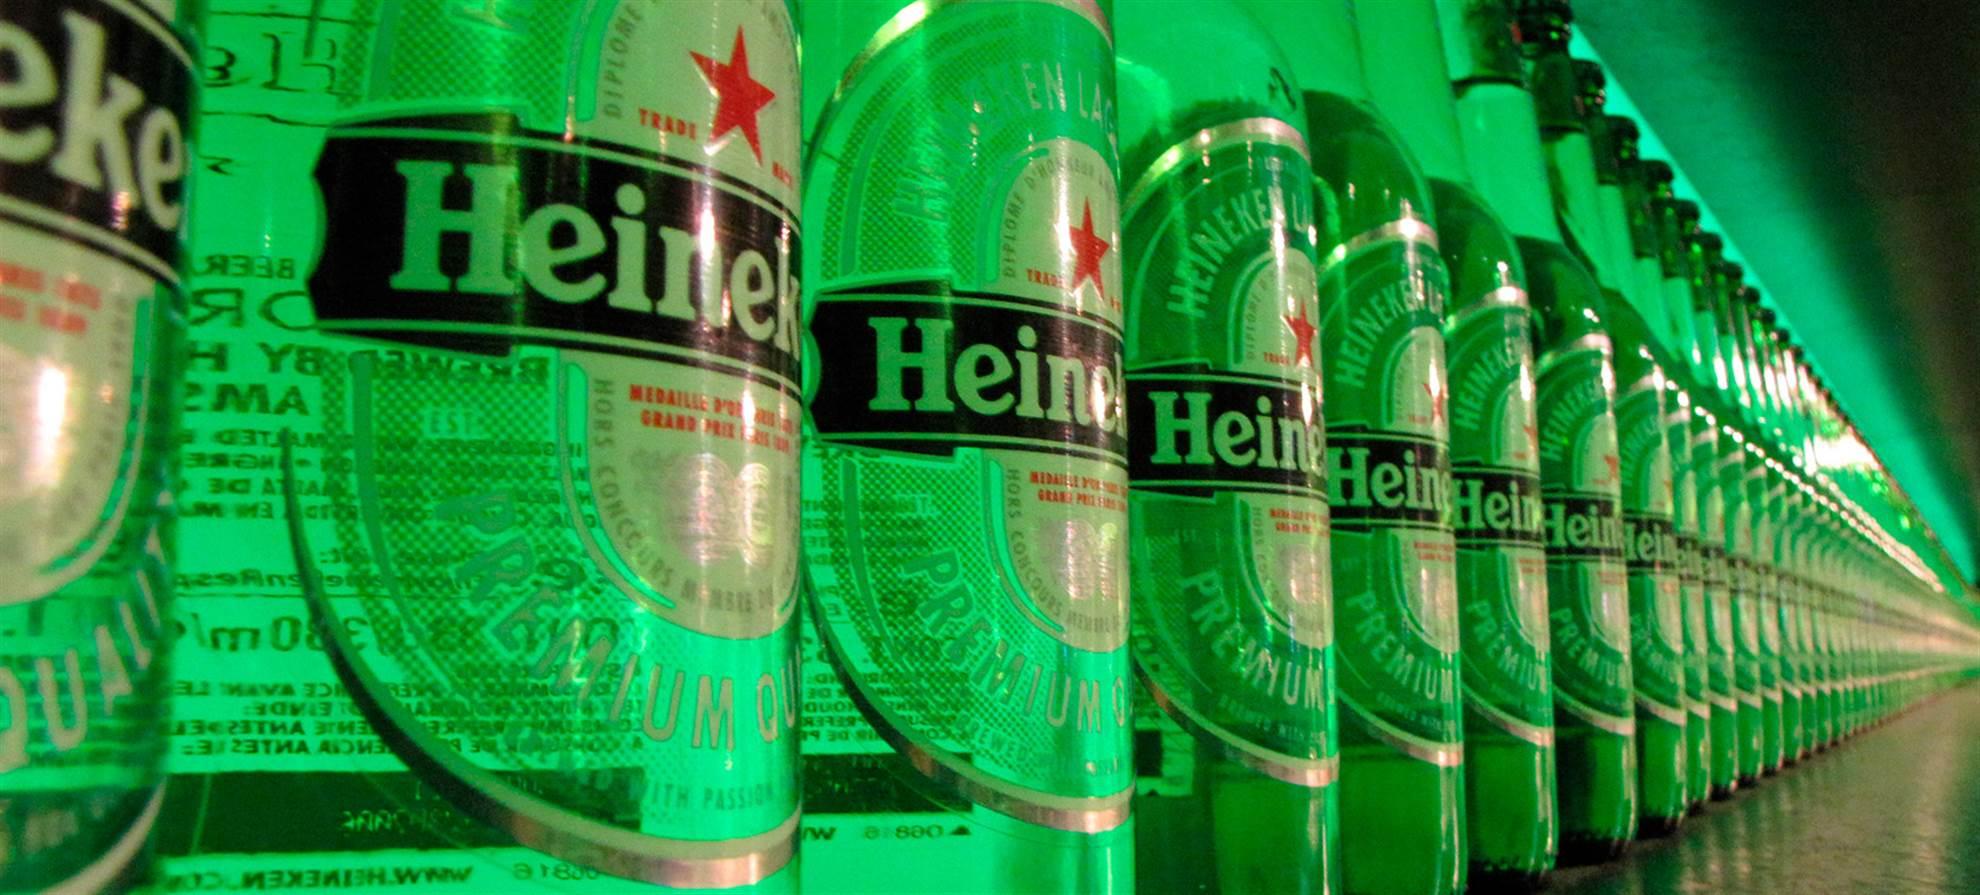 Expérience Heineken en VIP